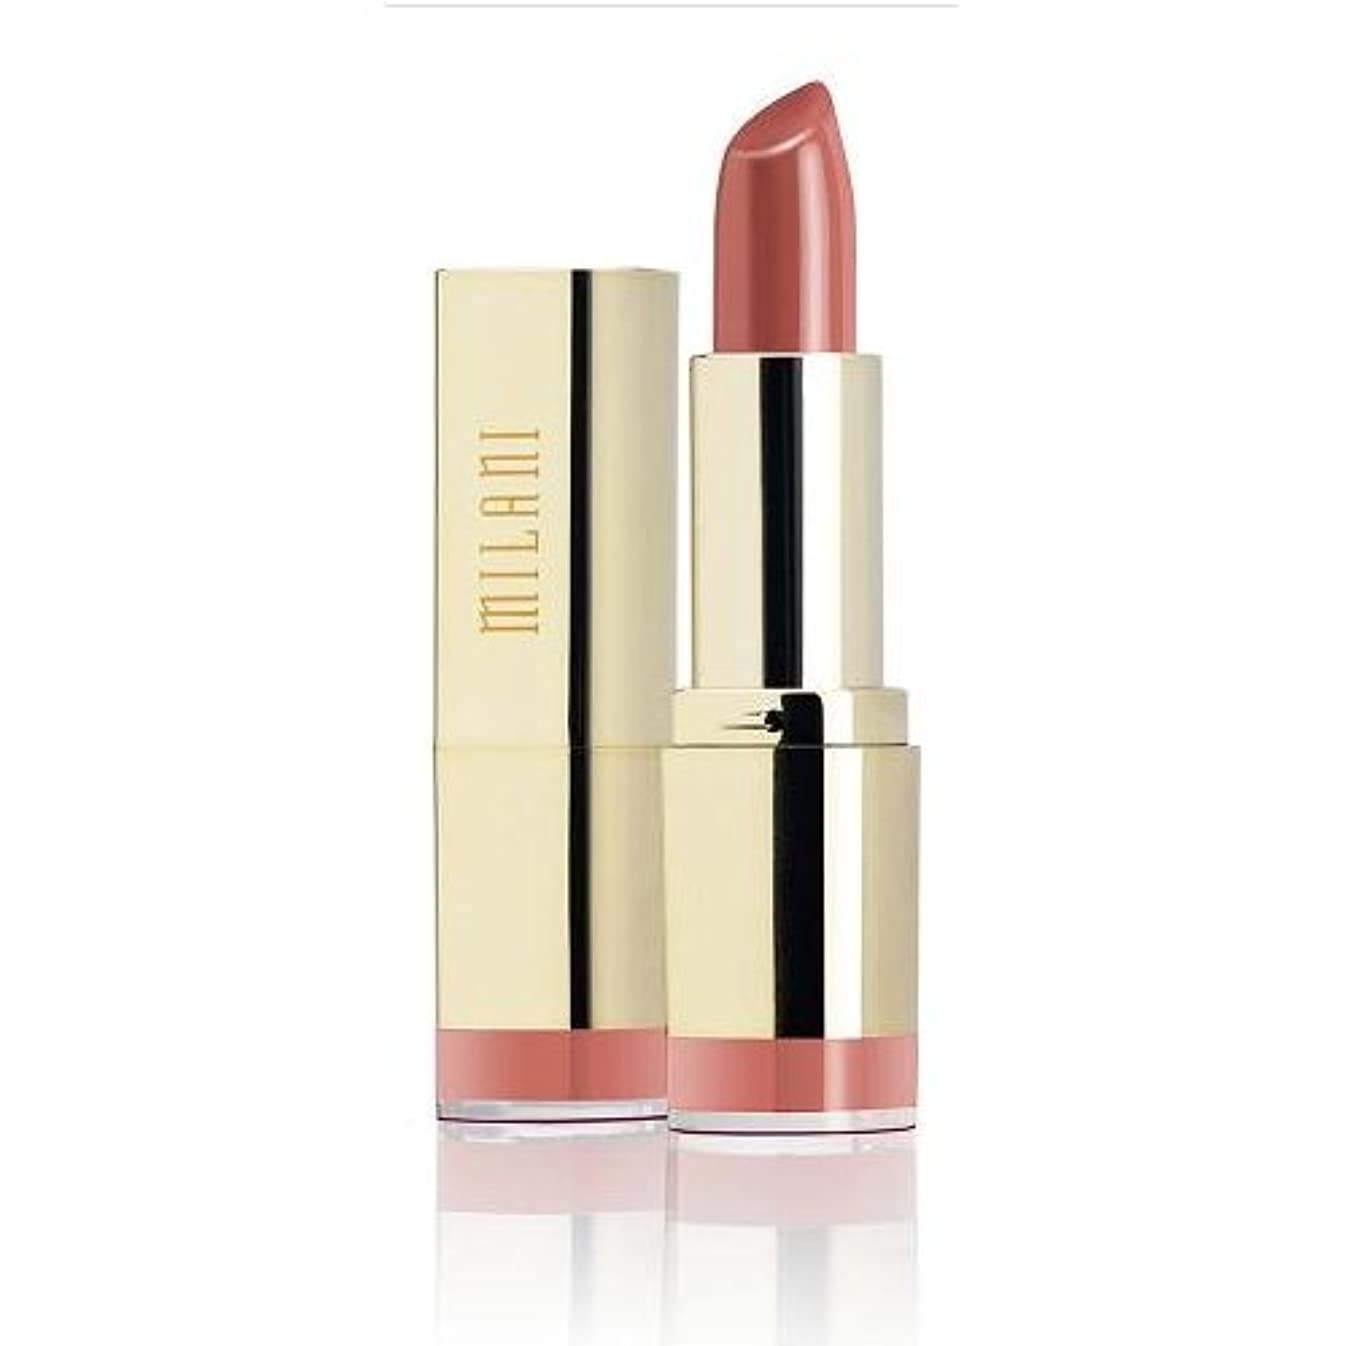 MILANI Color Statement Lipstick - Naturally Chic (並行輸入品)